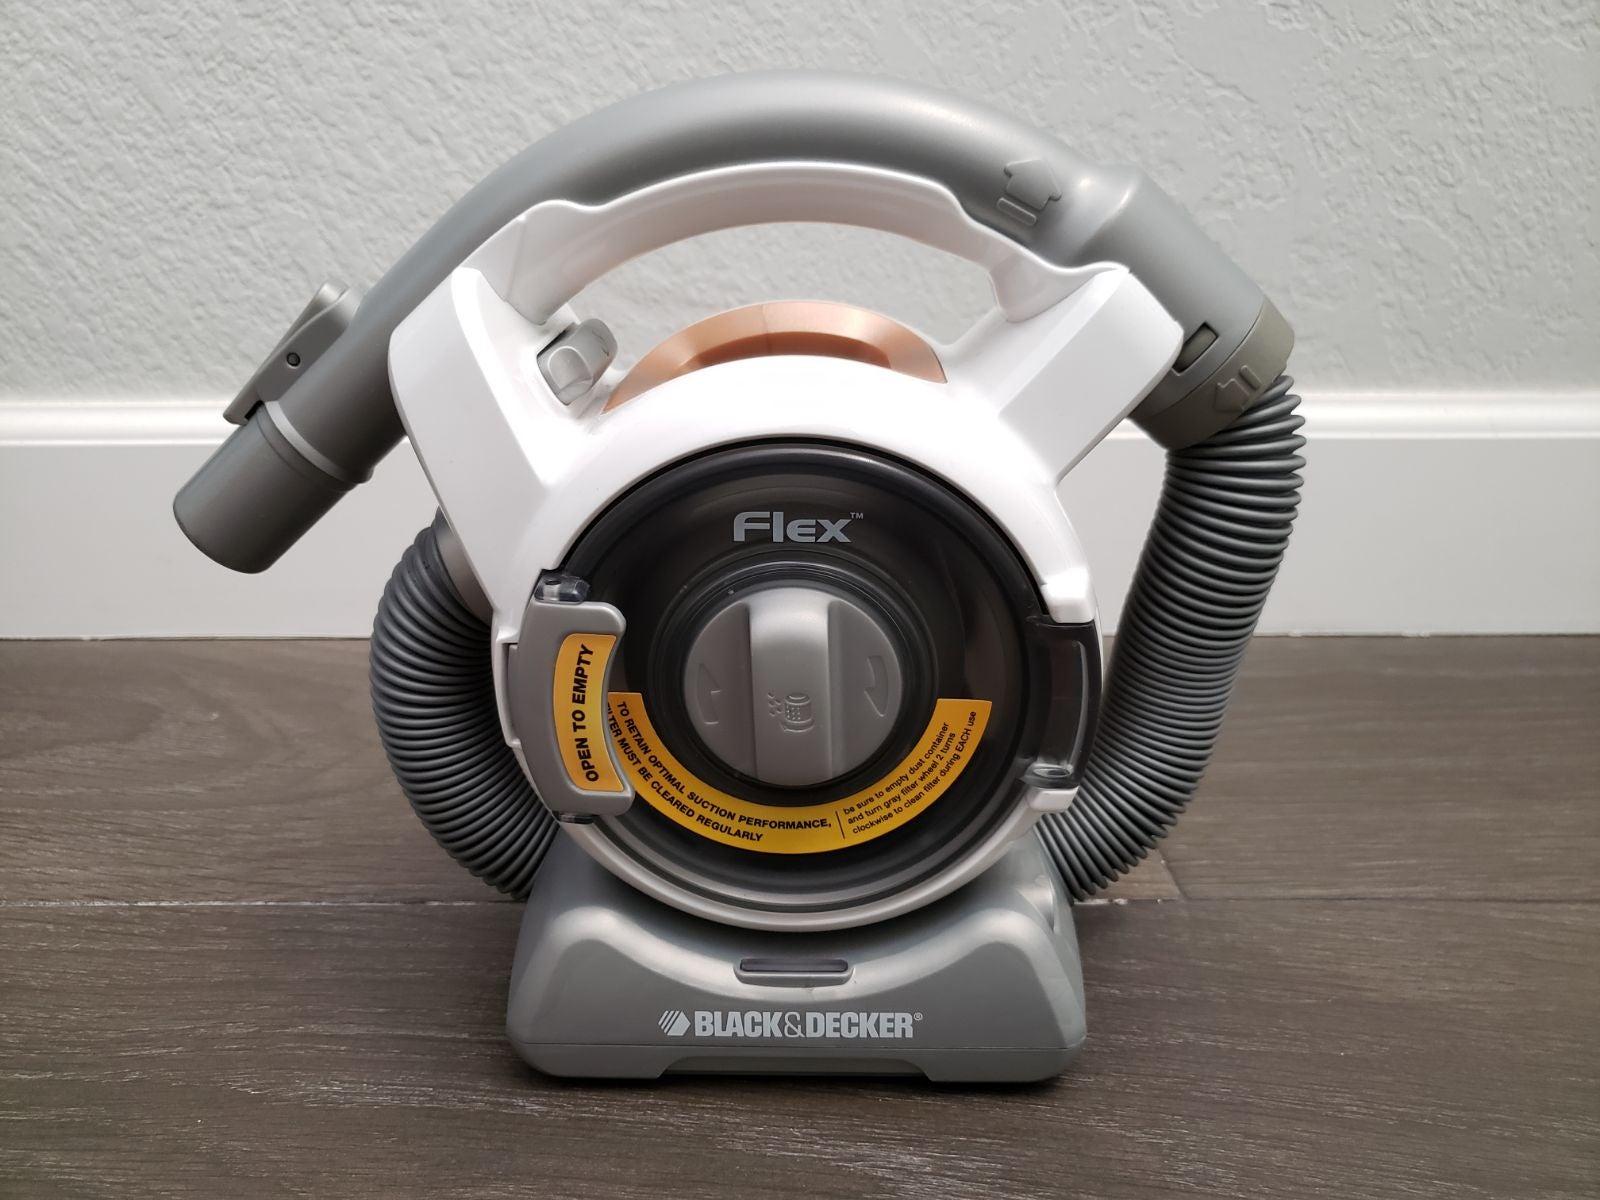 Black & Decker Cordless Vacuum